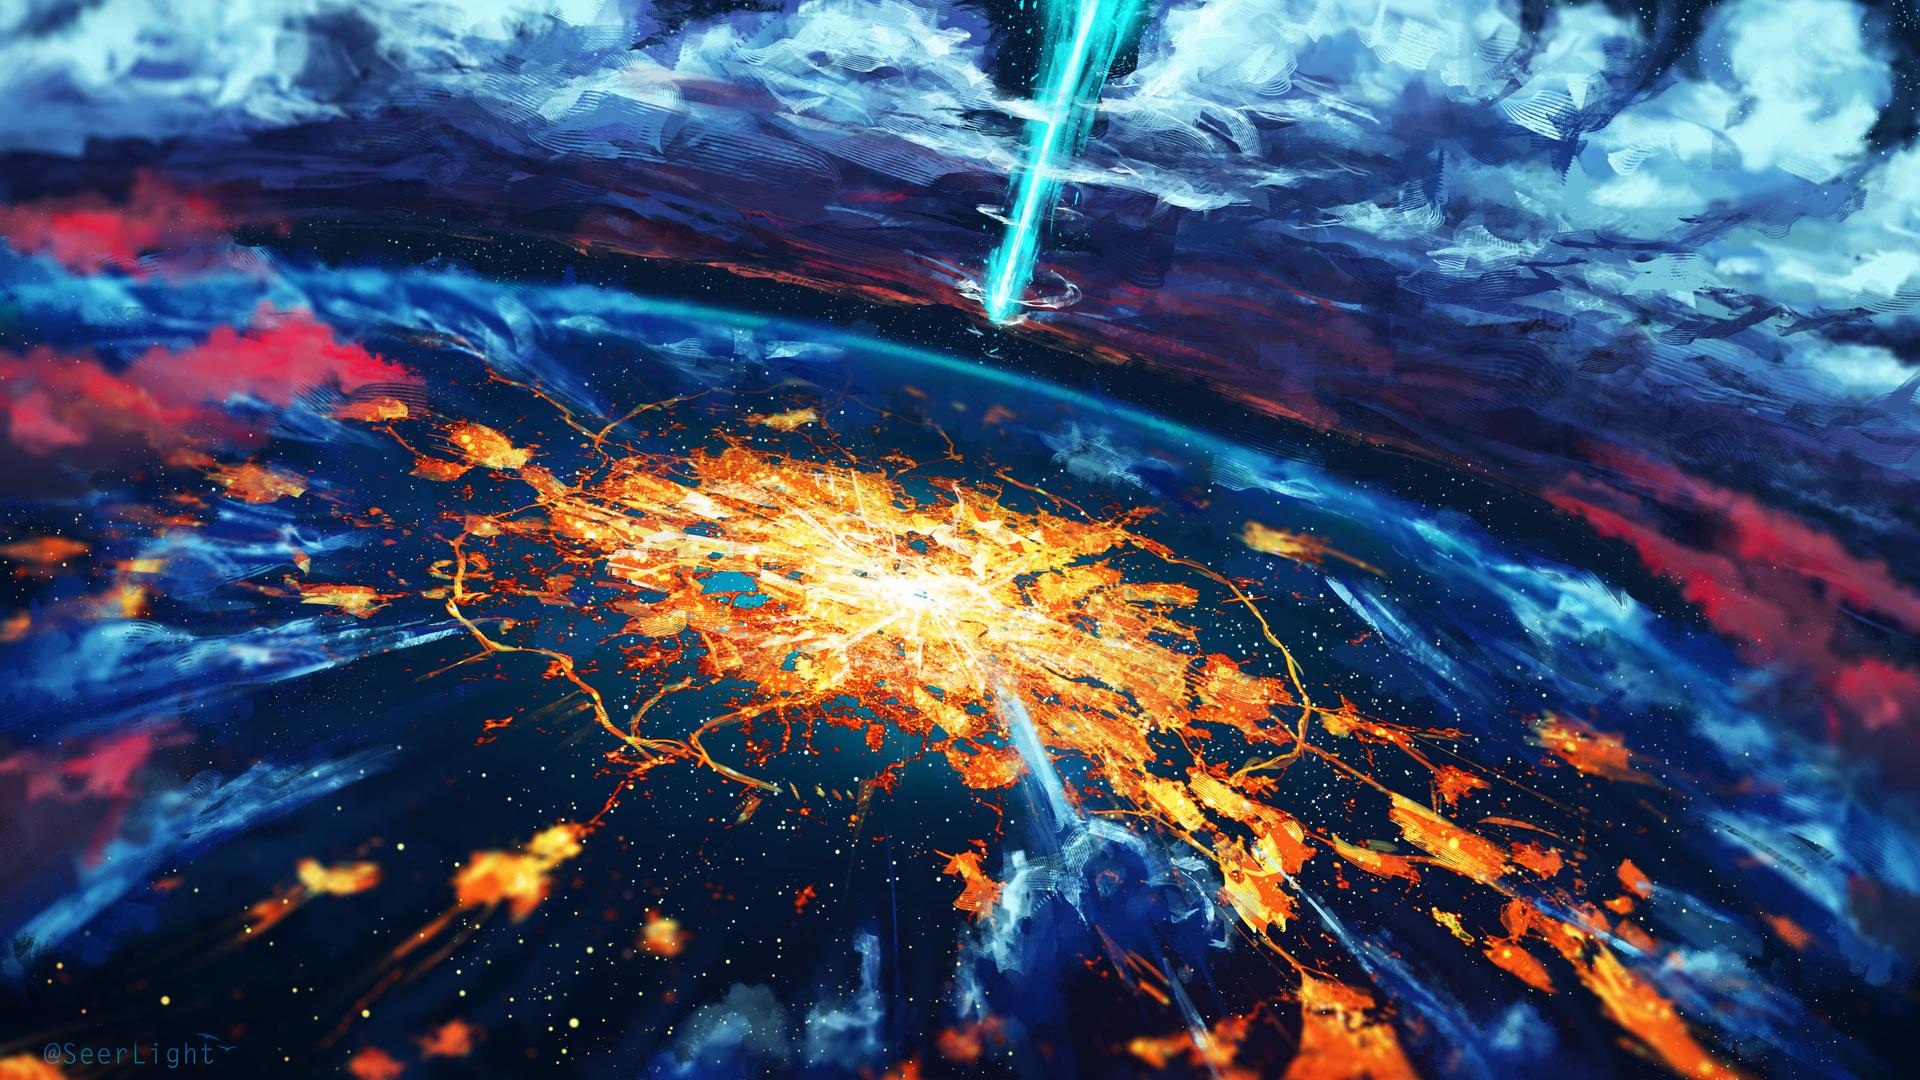 1920x1080 apocalypse cosmos disaster explosion world laptop full hd